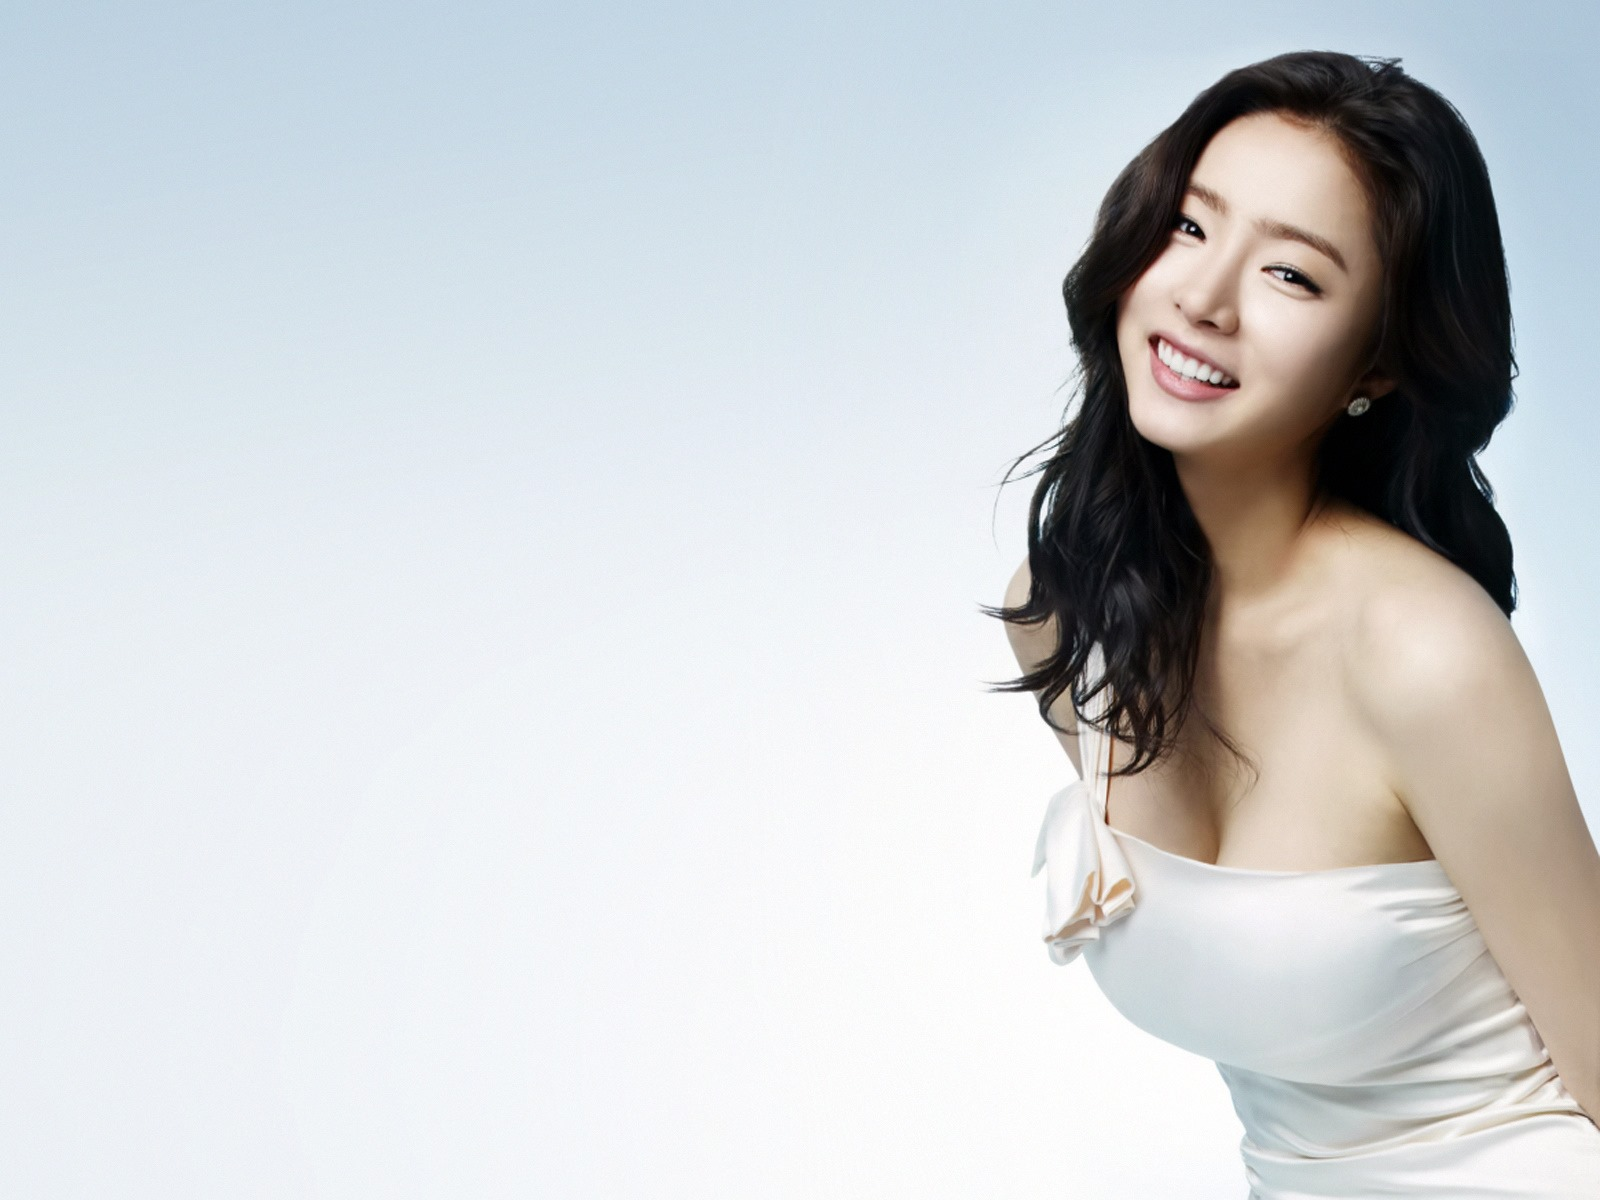 Hd korean girl wallpaper 1600x1200 voltagebd Images